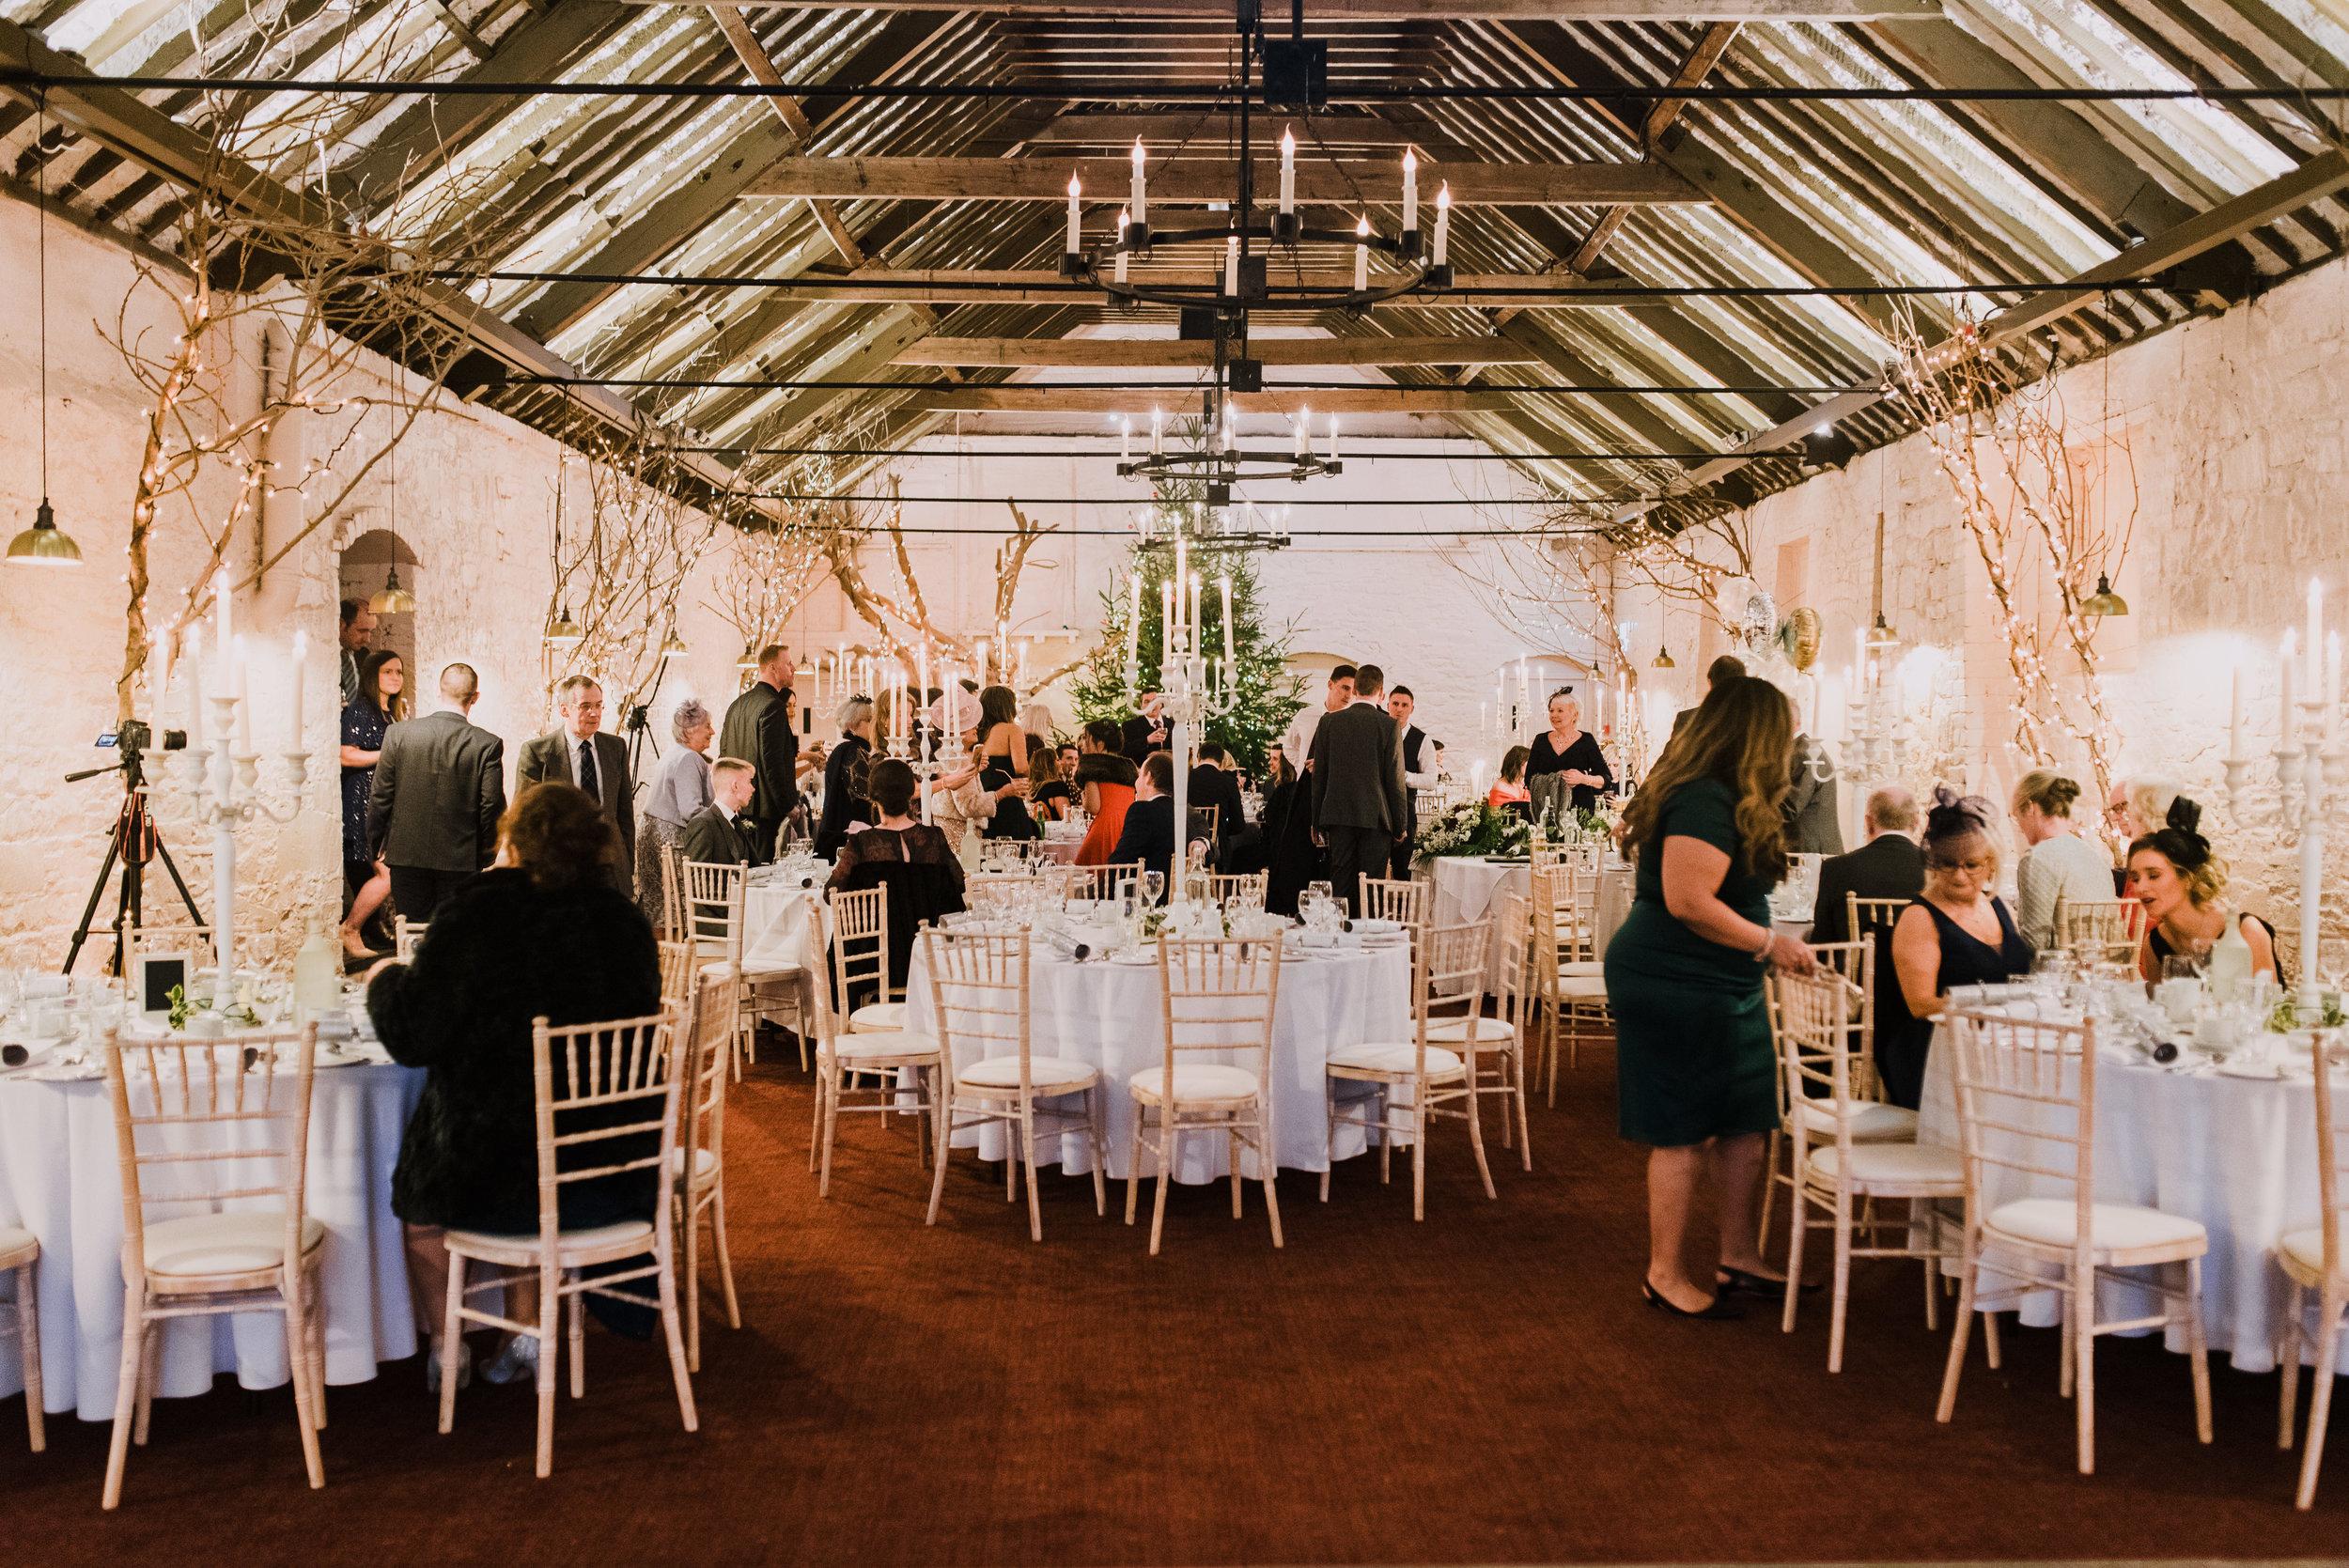 larchfield estate wedding, wedding venues northern ireland, barn wedding venues northern ireland, wedding photos larchfield estate, shane todd wedding, larchfield wedding decor ideas (7).jpg